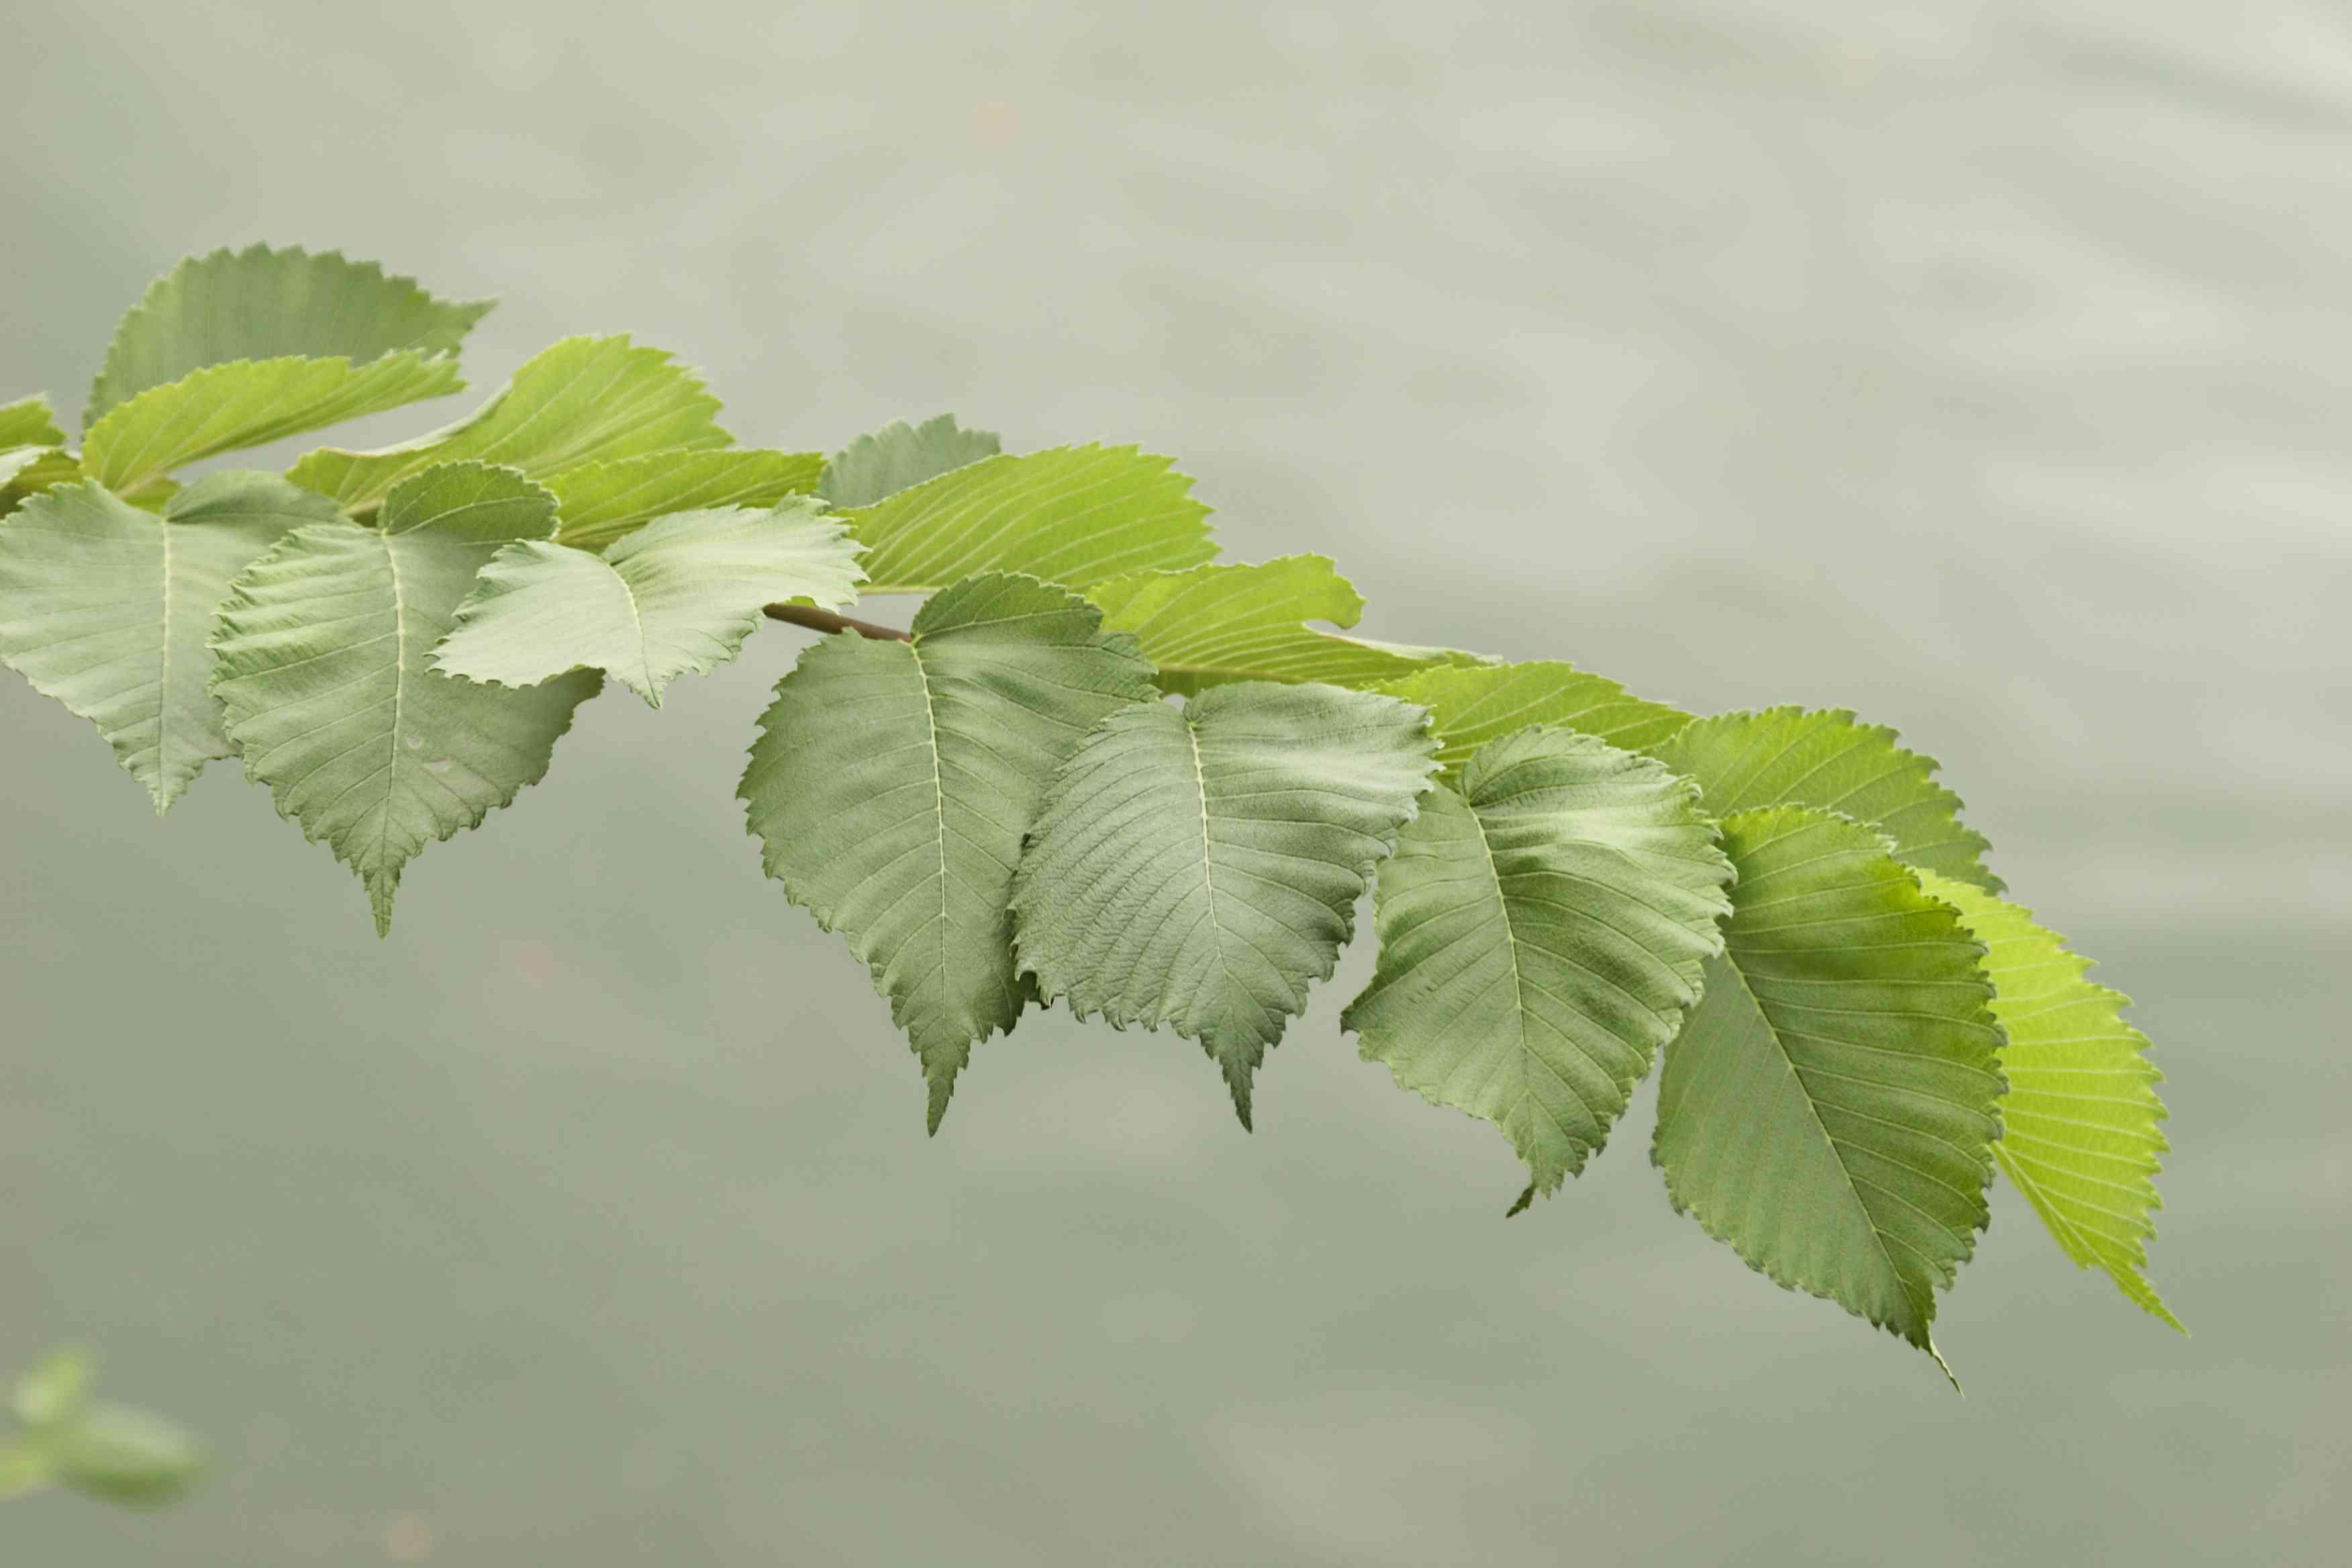 Green American elm tree branch